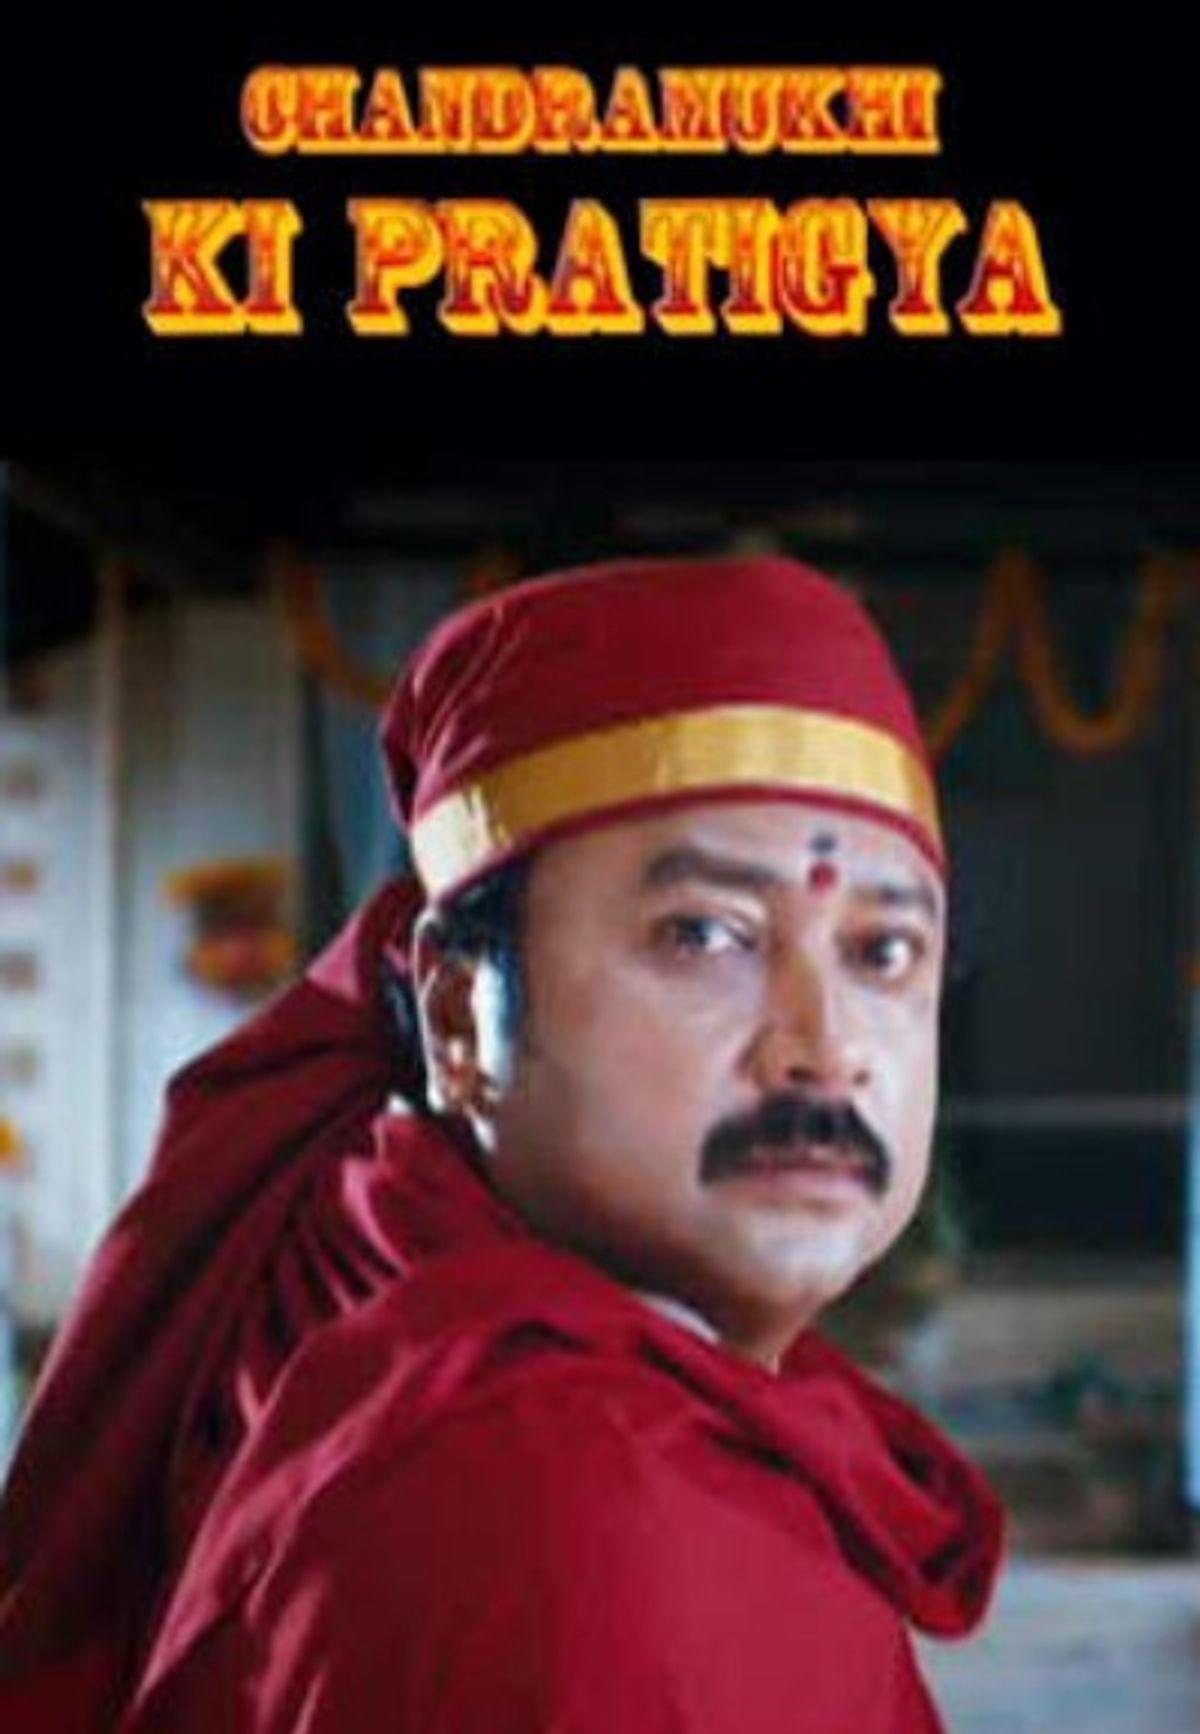 Chandramukhi Ki Pratigya